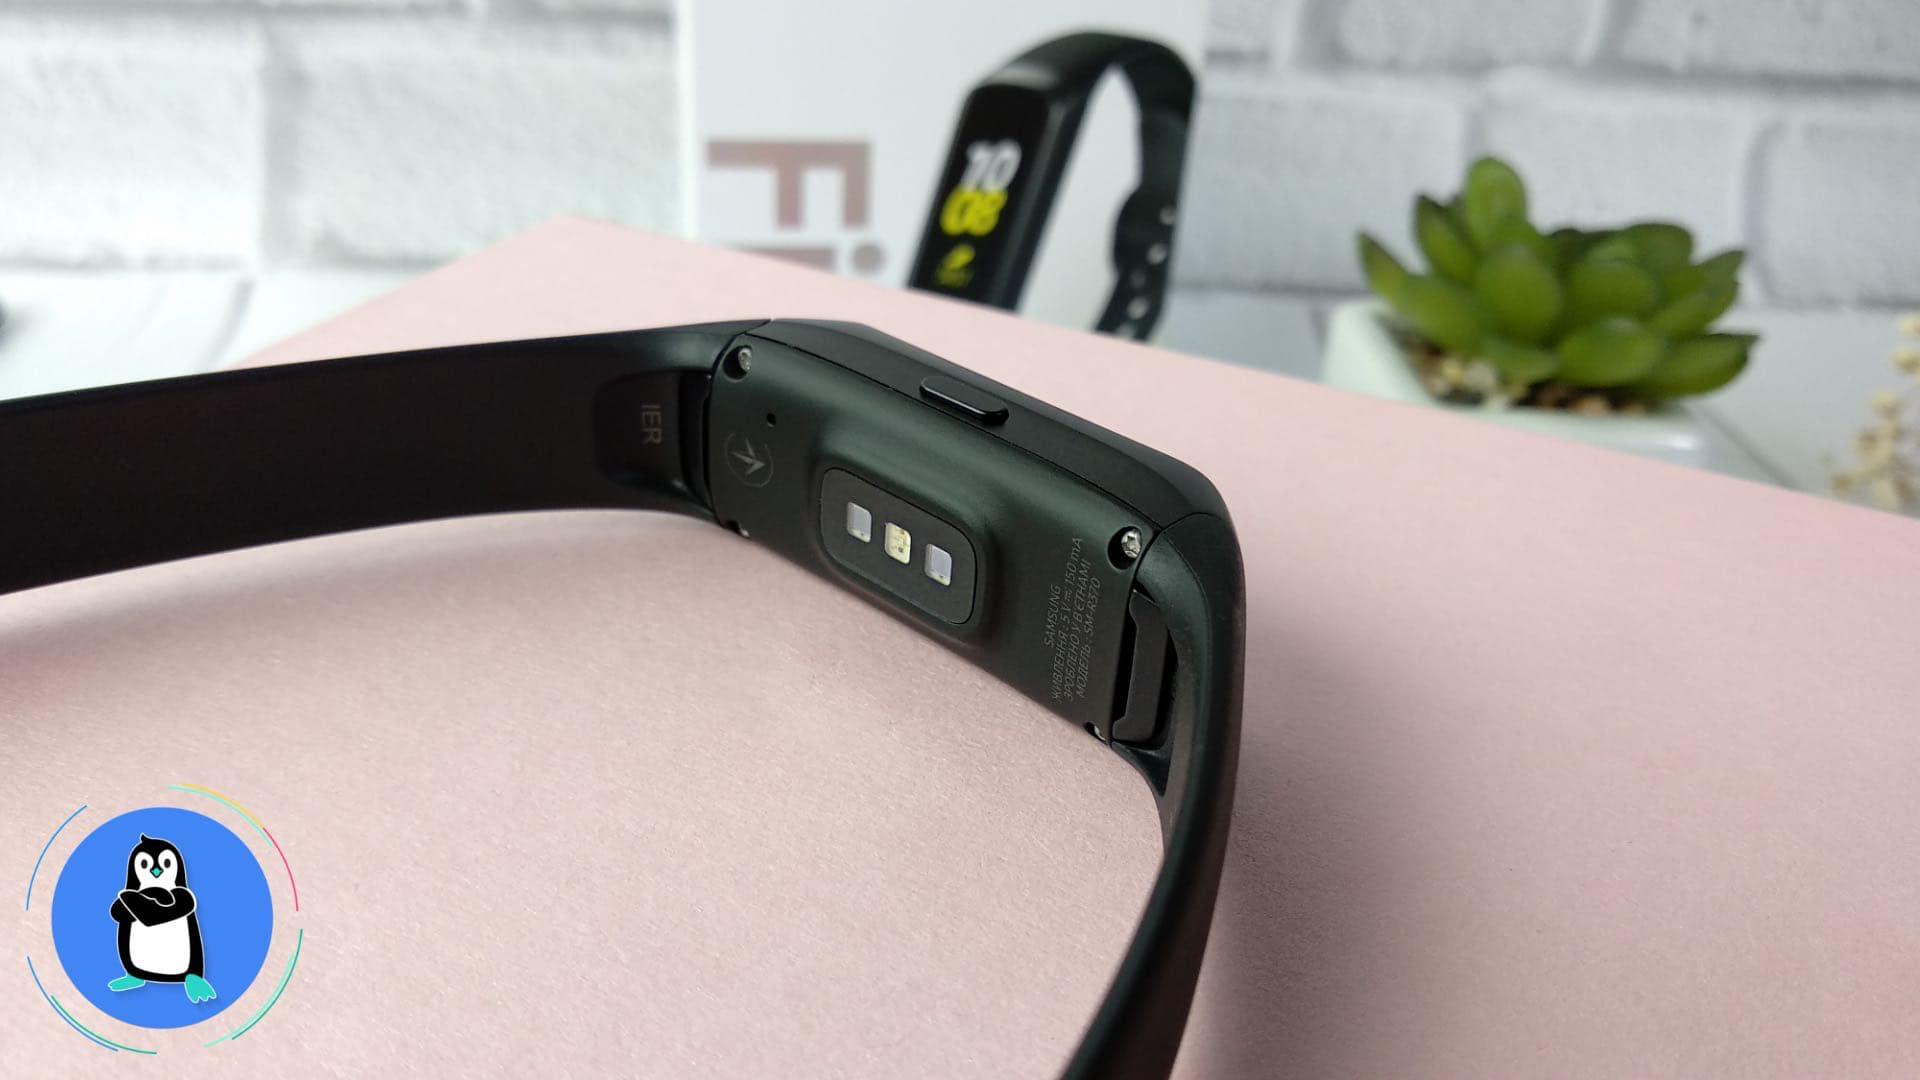 Samsung Galaxy Fit: огляд збалансованого фітнес-браслета зі своїми недоліками